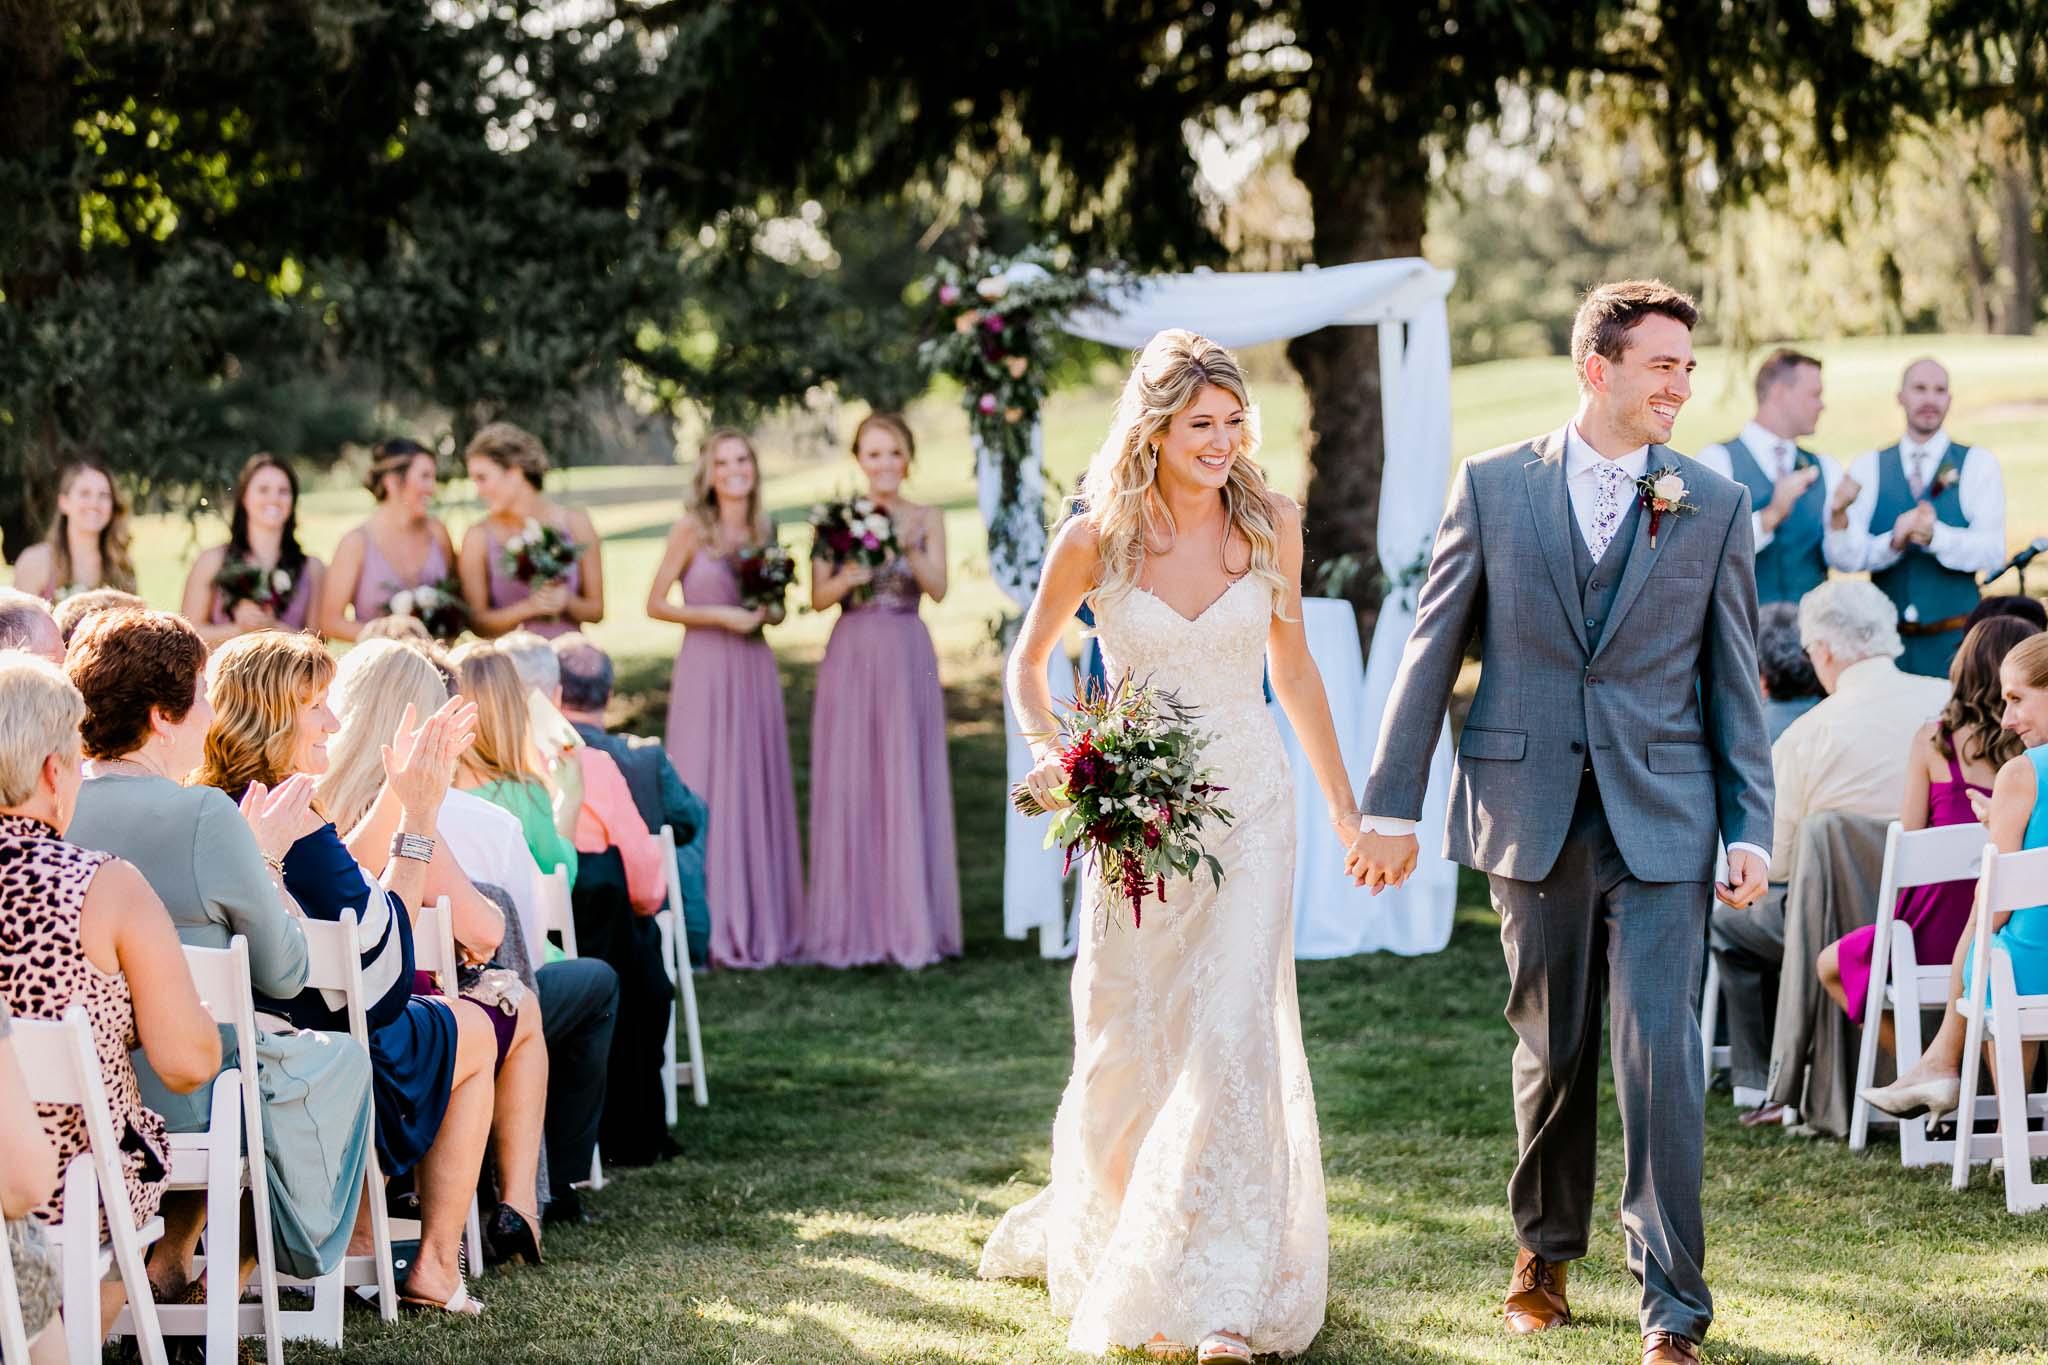 Frosty-Valley-September-Wedding-8152.jpg